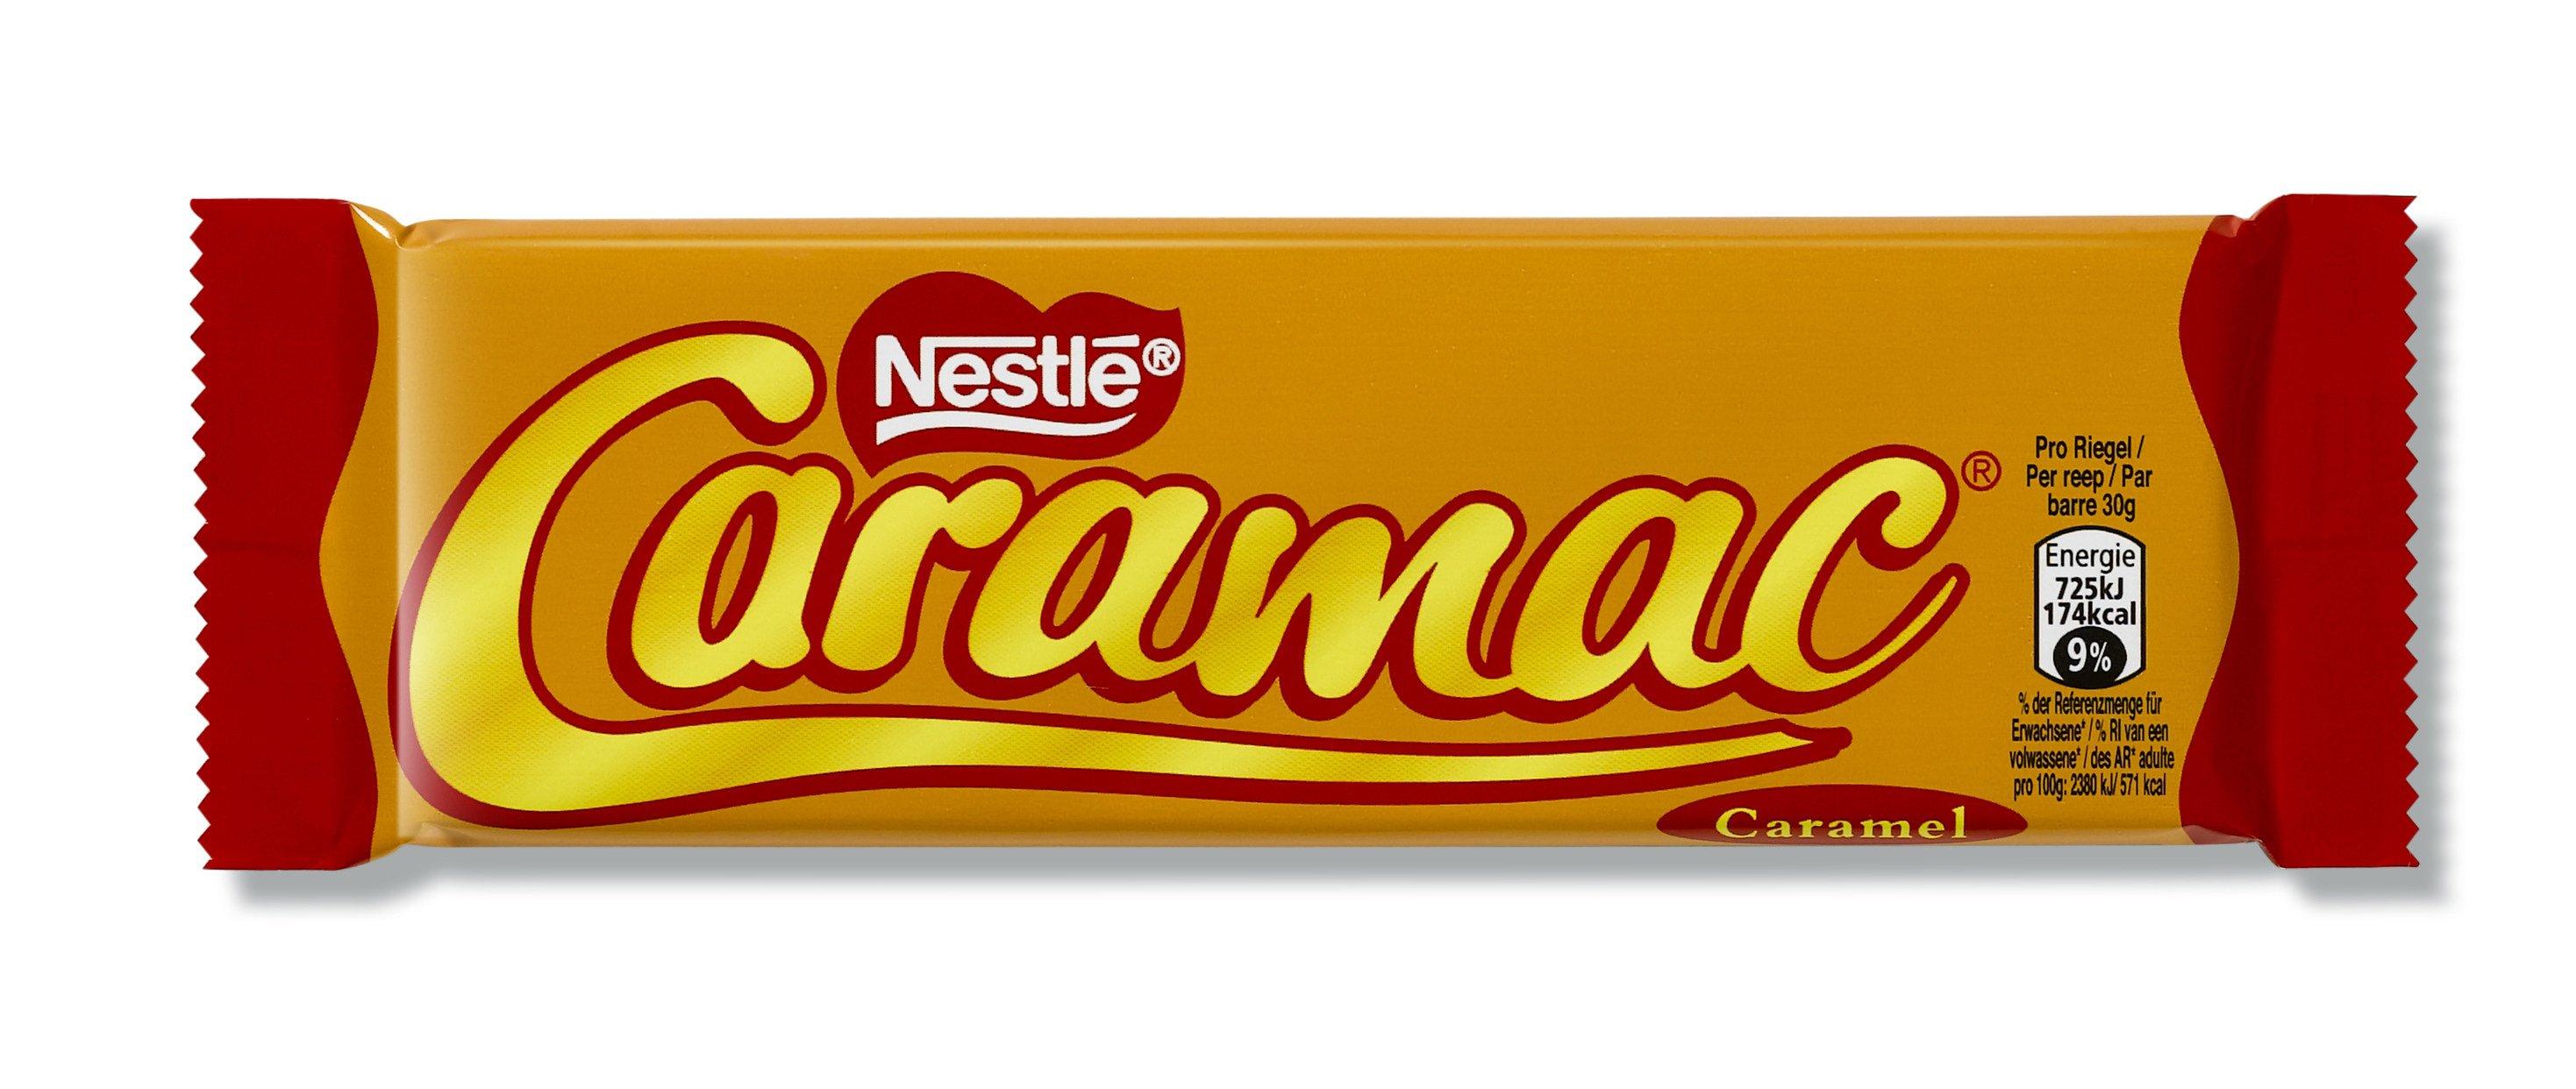 Nestlé   Caramac   Single   36 stuks